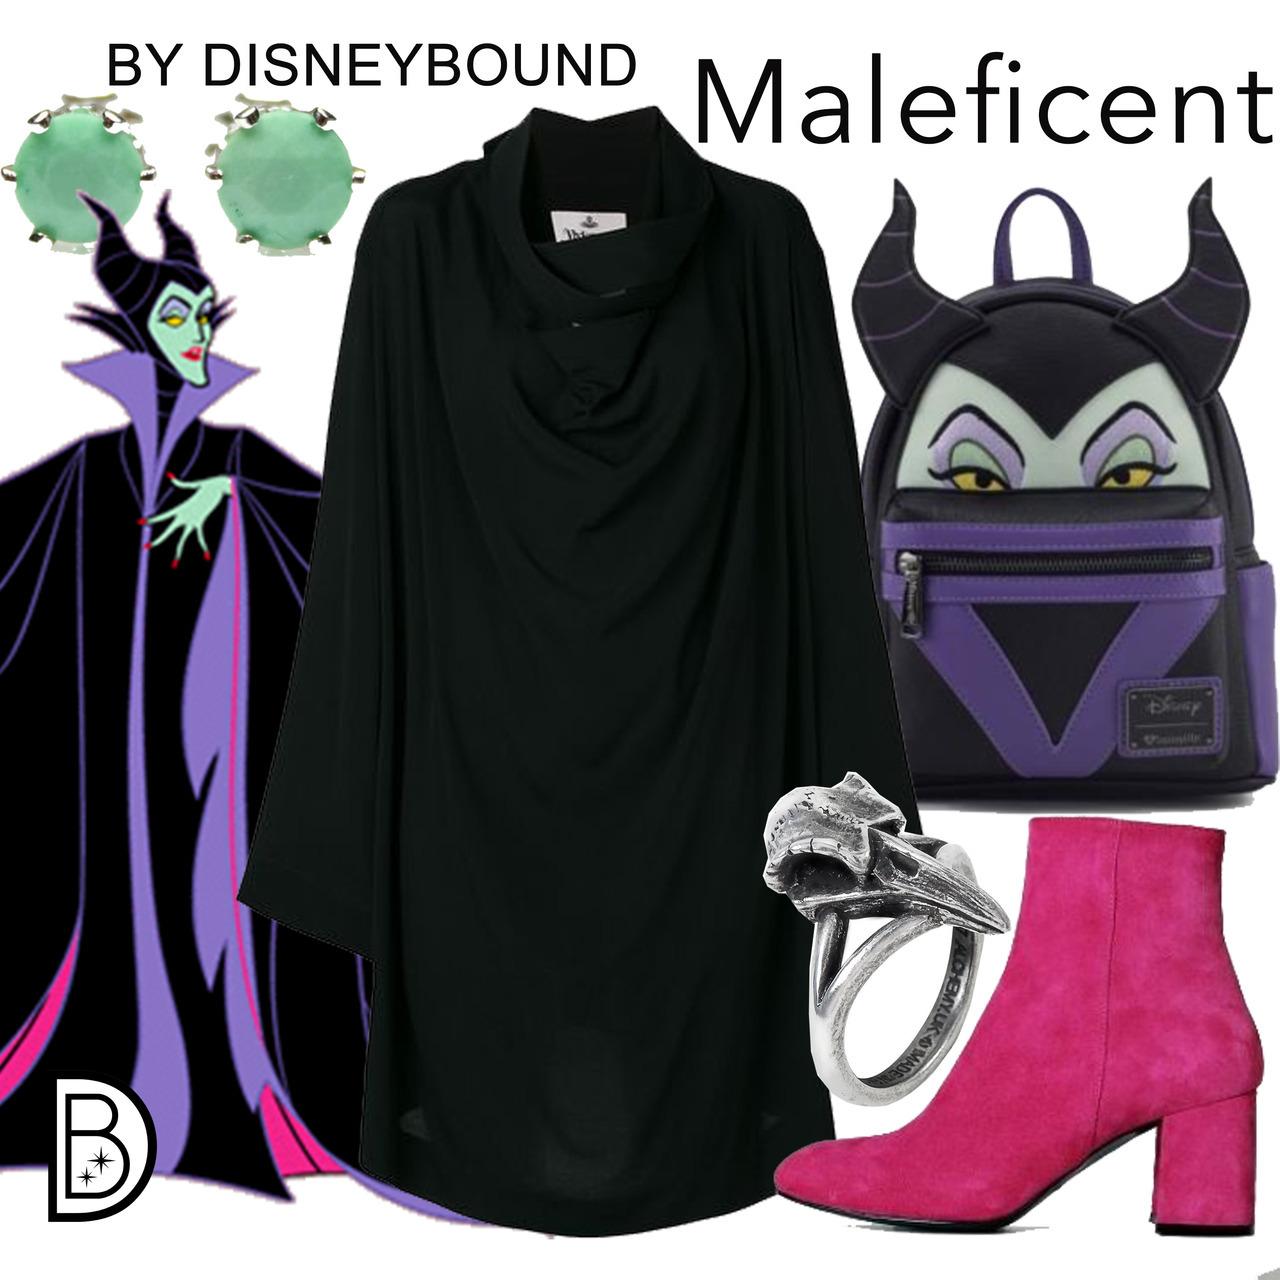 More Dress Farfetch Boots Asoslive Purse Disneybound